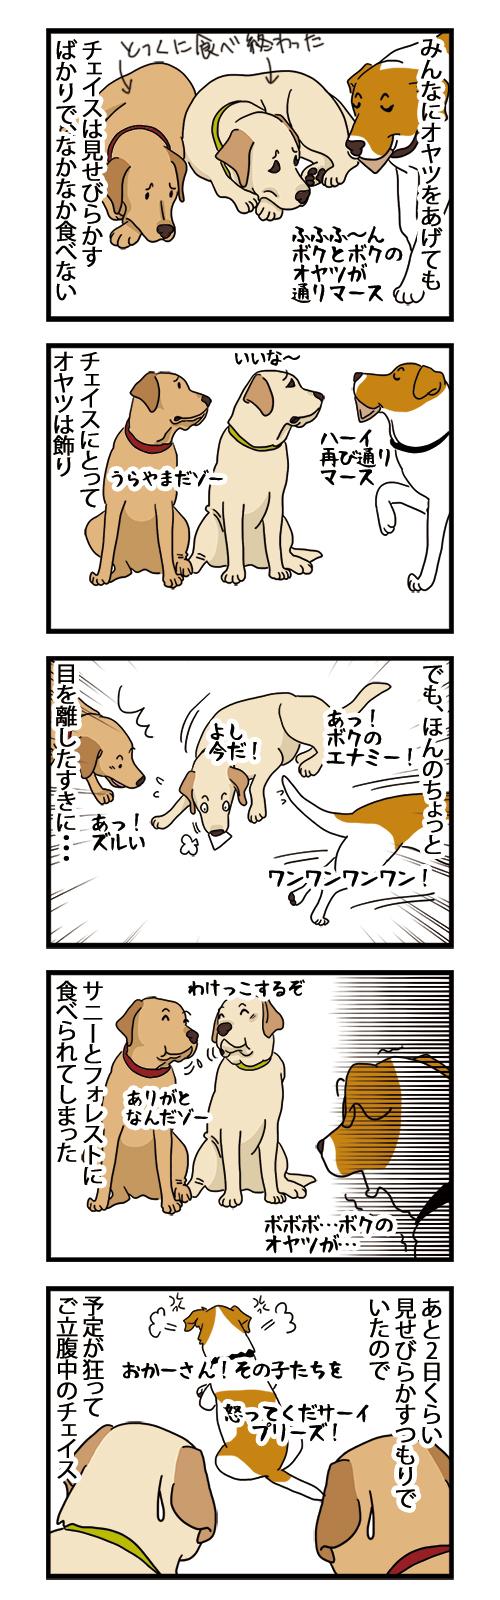 13122020_dogcomic.jpg